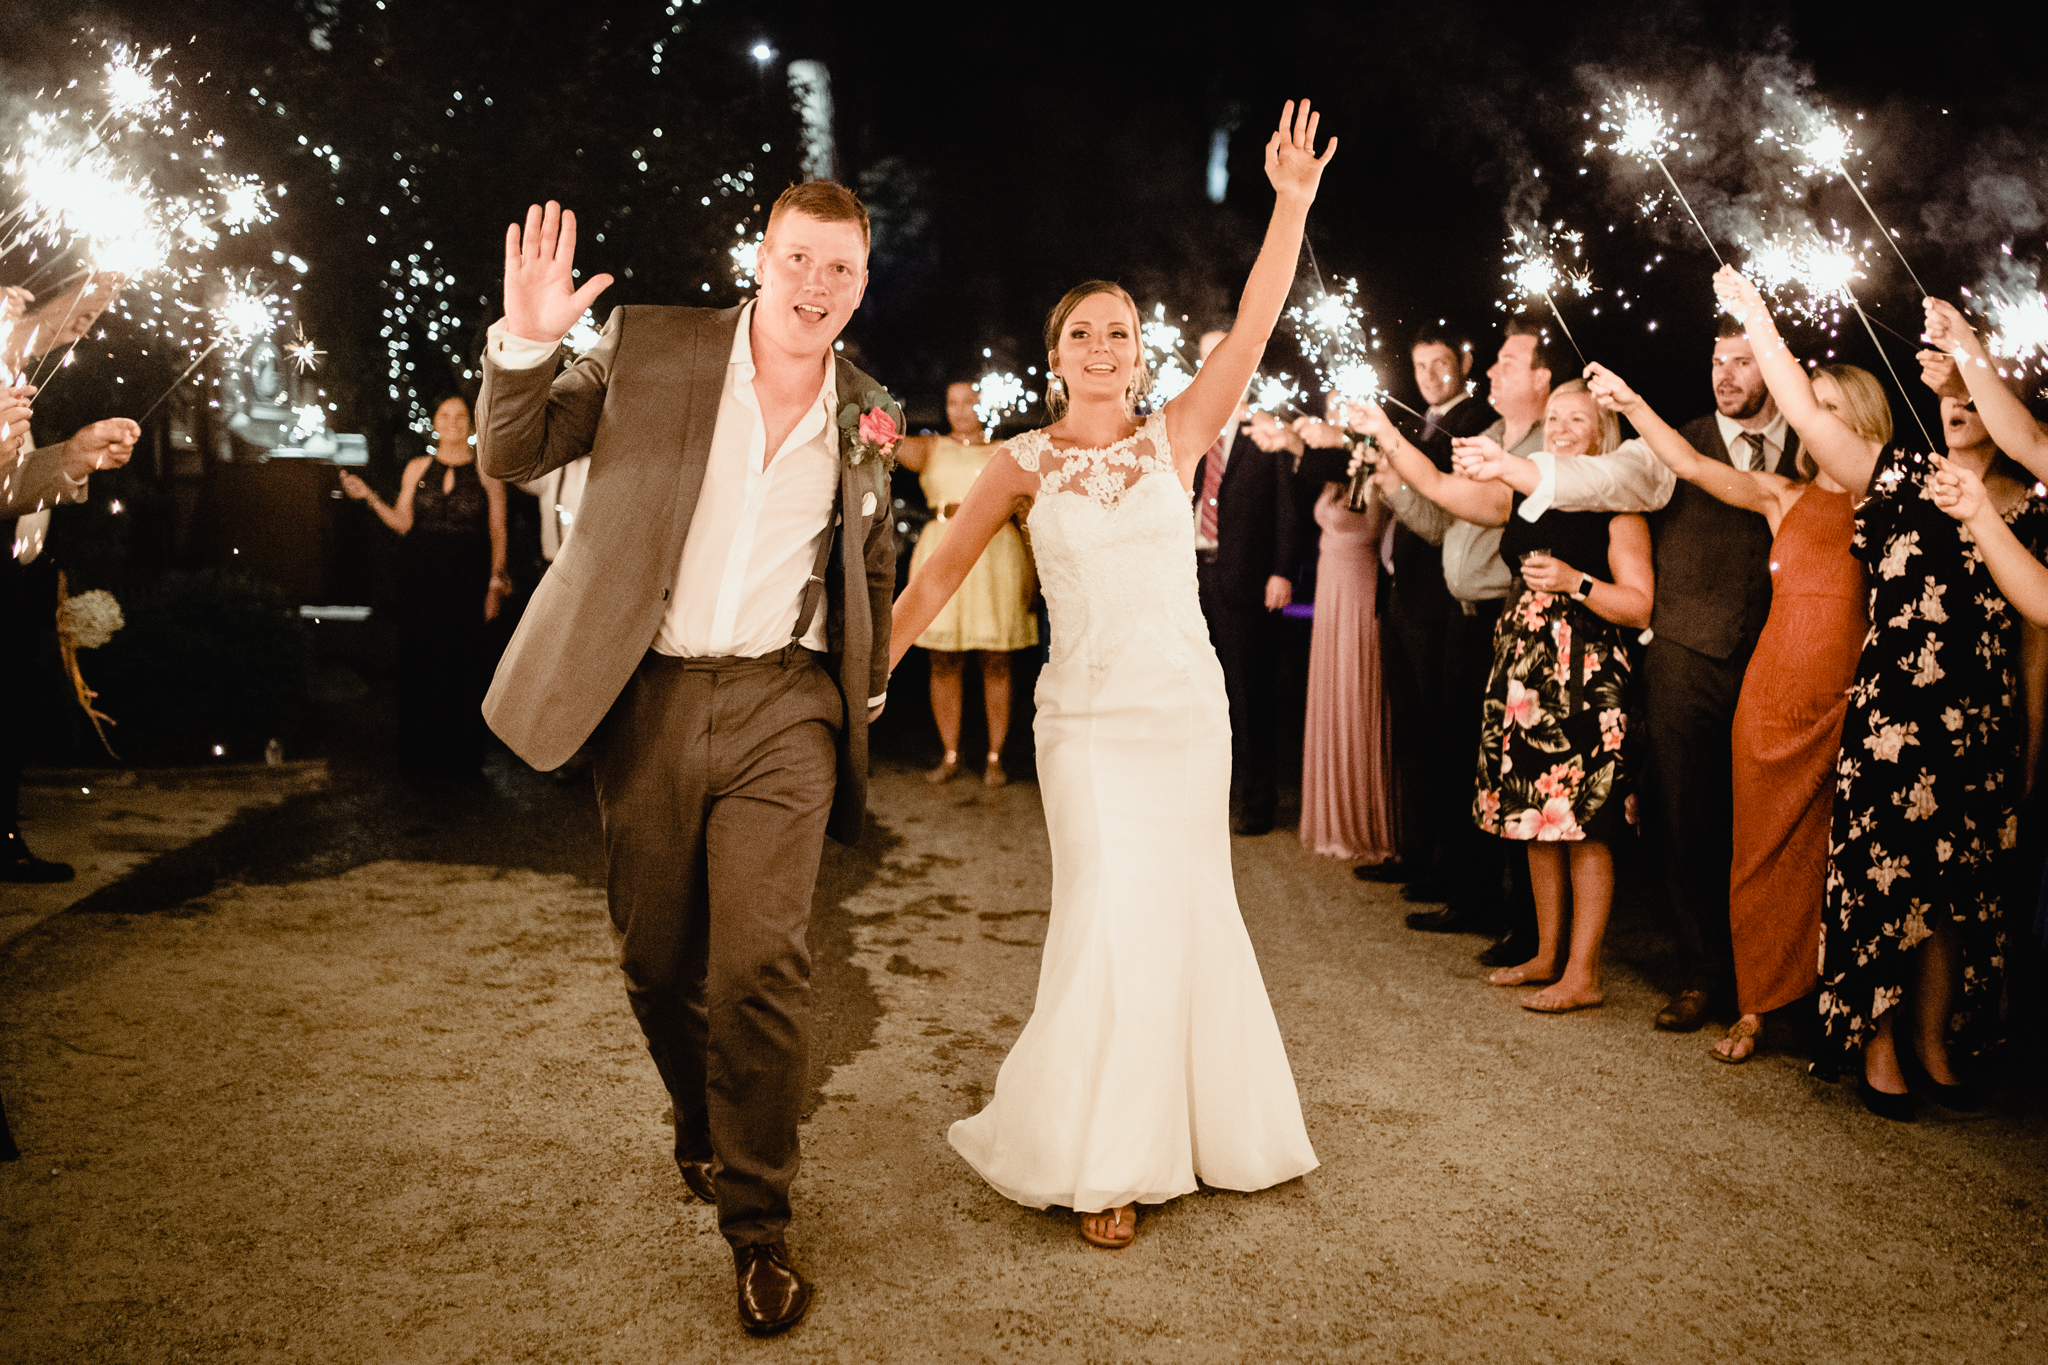 MonicaLeavell-Georgia-Carolina-Intimate-Wedding-Photographer-2.jpg